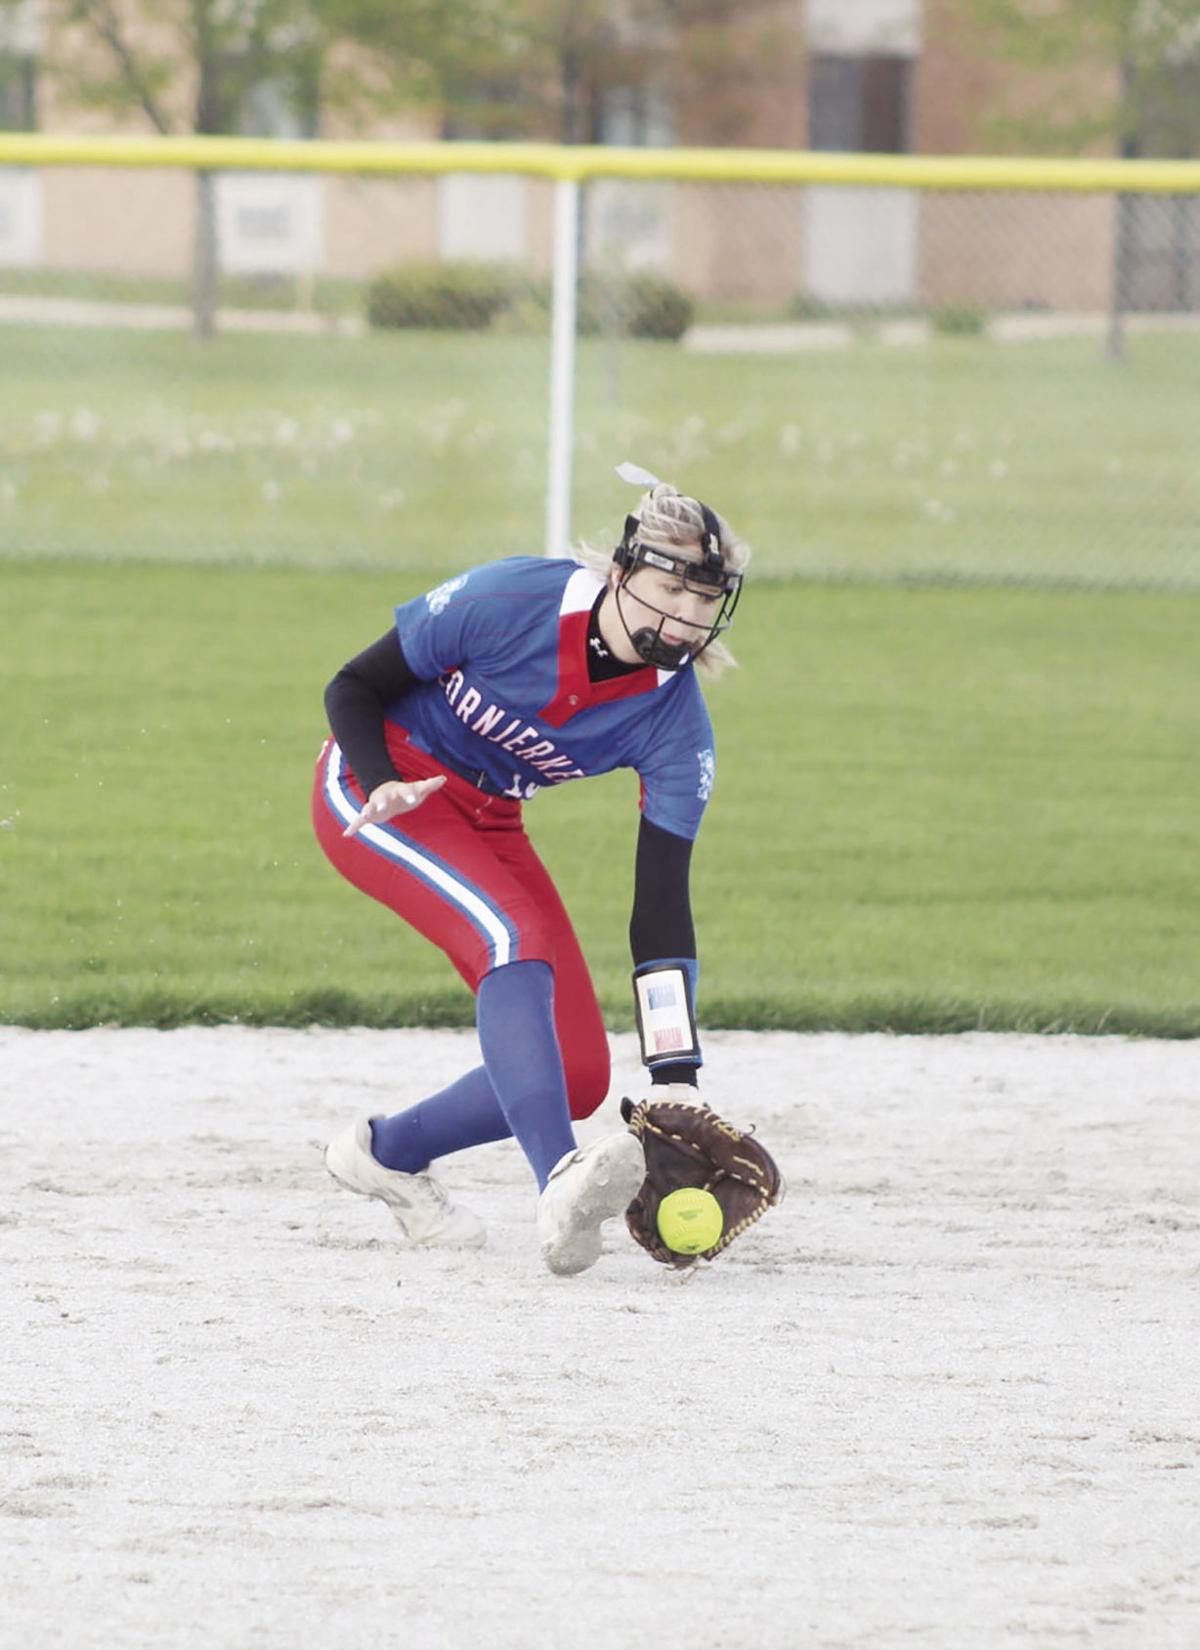 Softball Pic 1.jpg